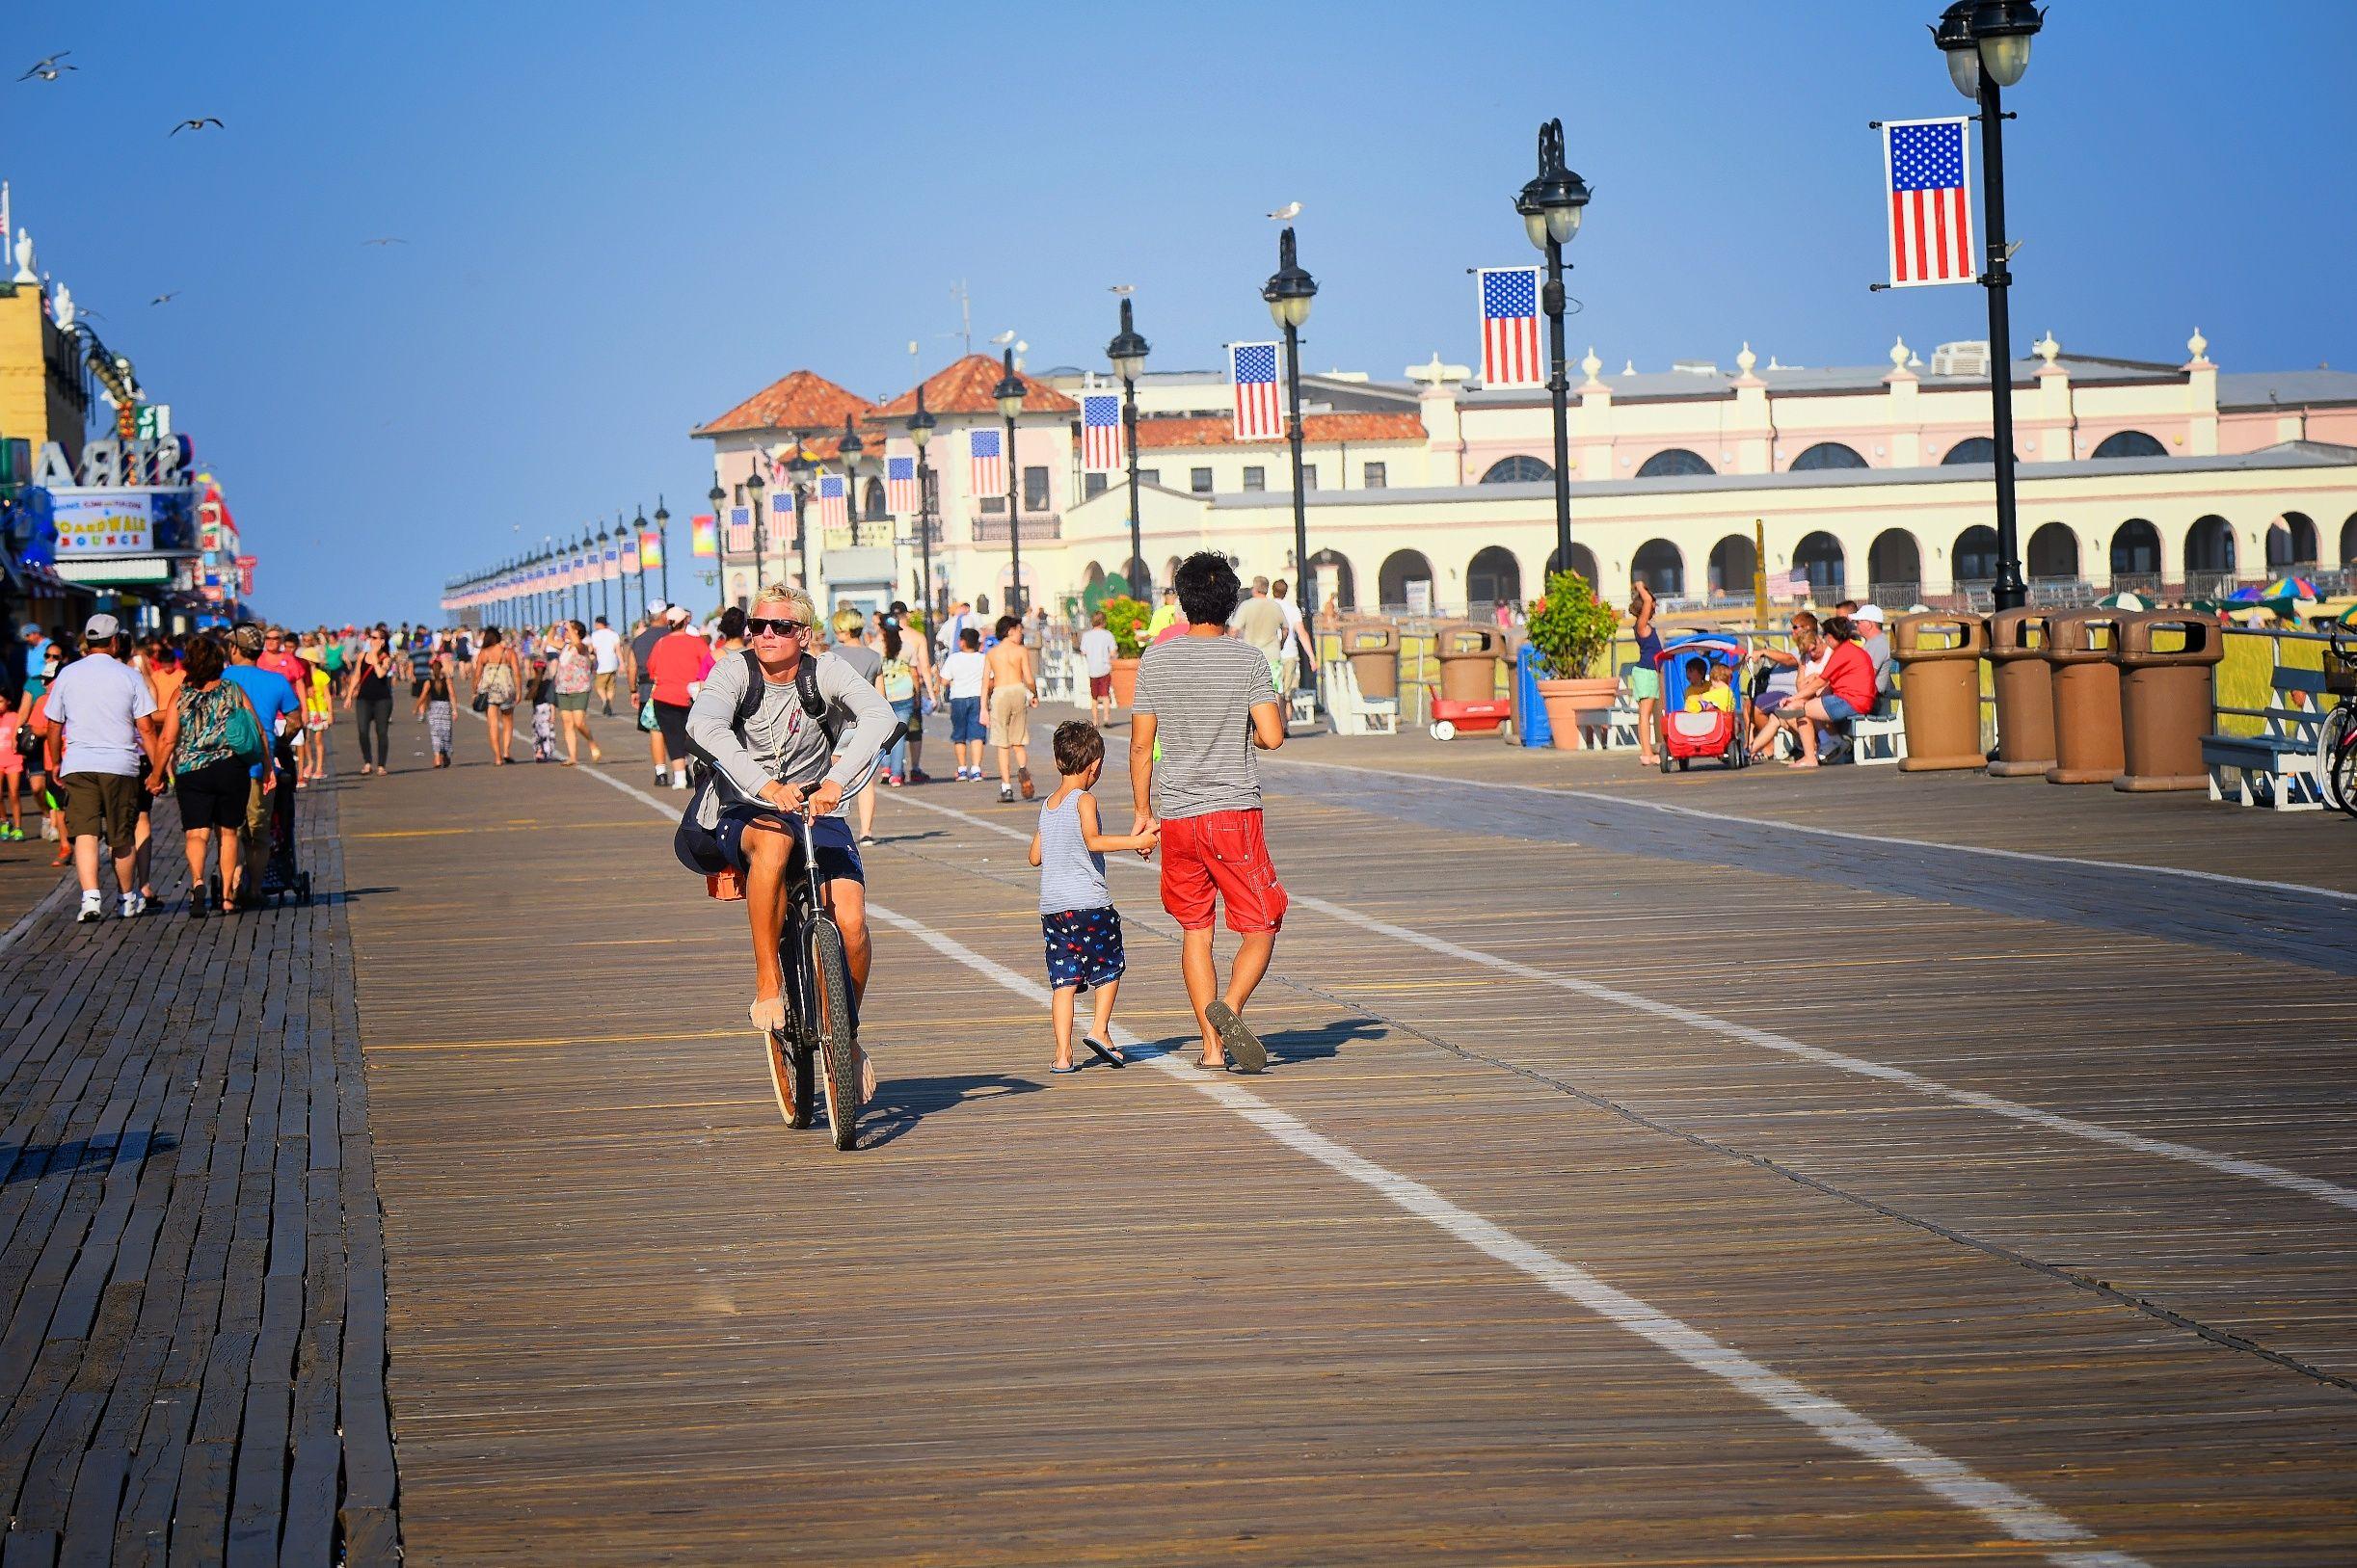 Tourists on the beach Cape May, NJ